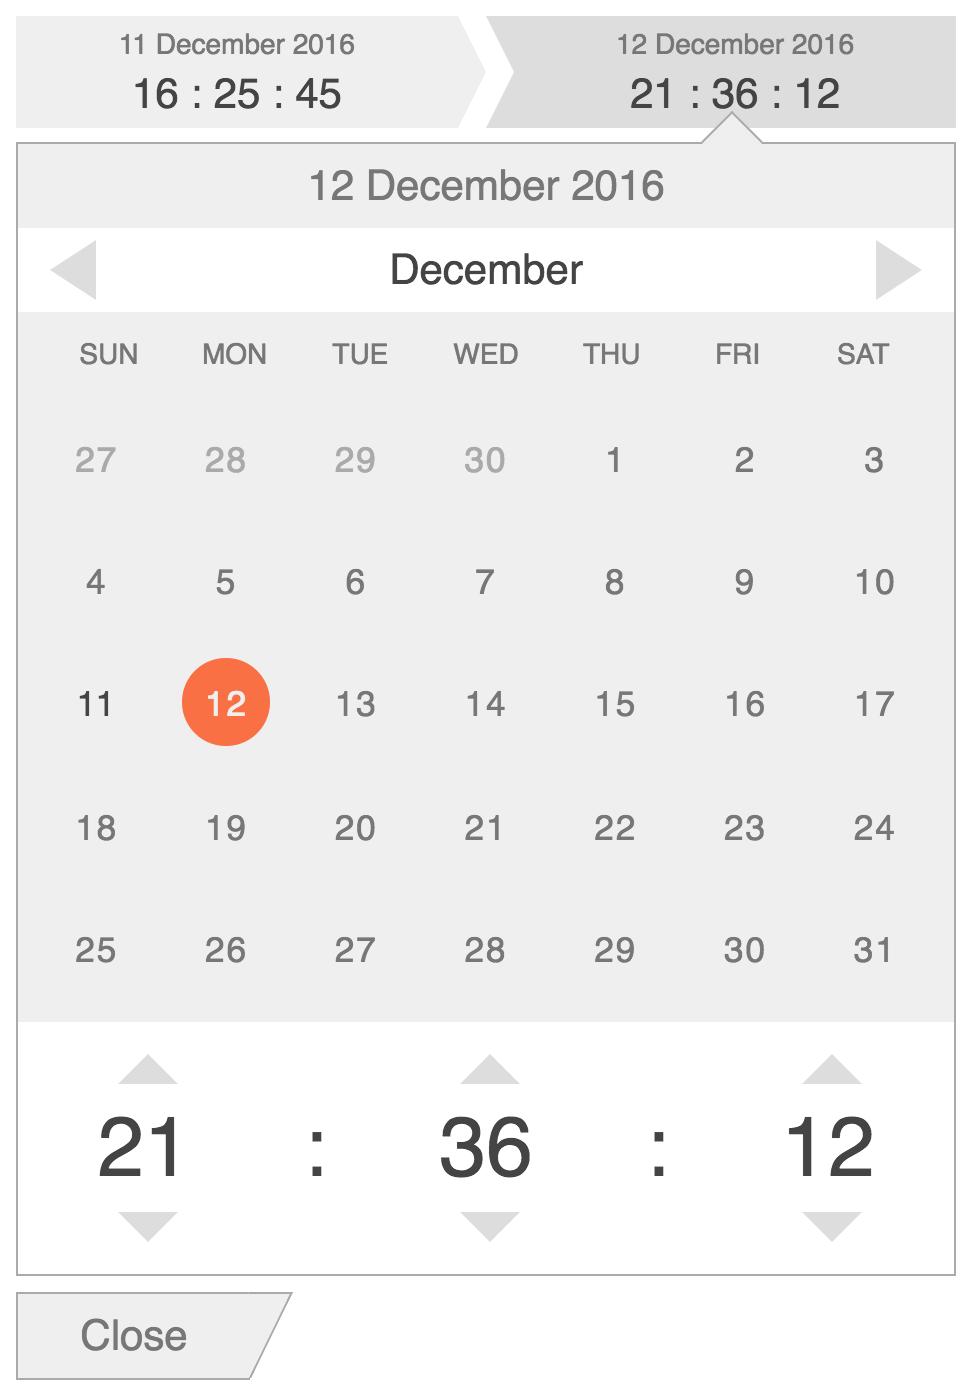 Angular directive datetime range input - datetime range (expanded)